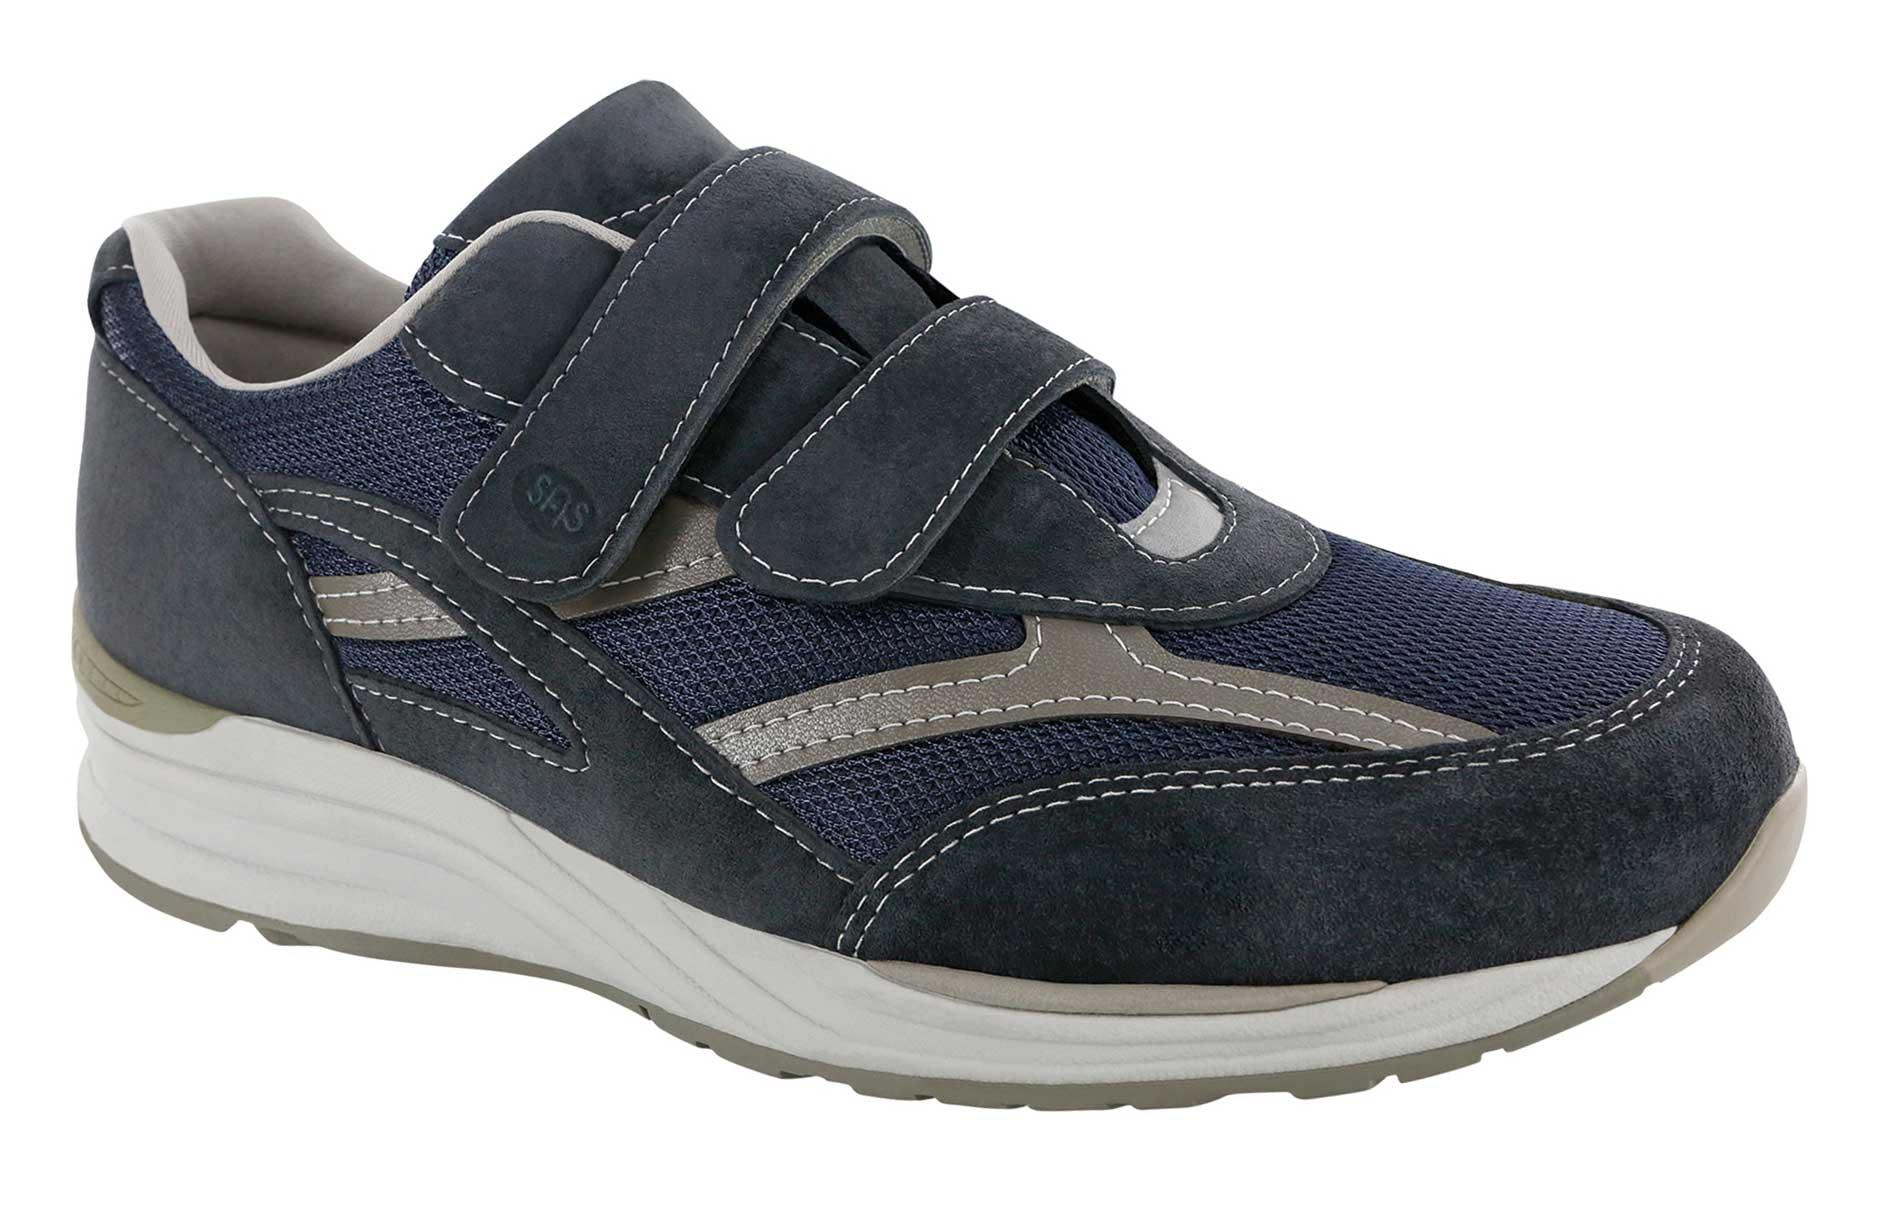 SAS Mens JV Mesh Diabetic Active Shoes Gray